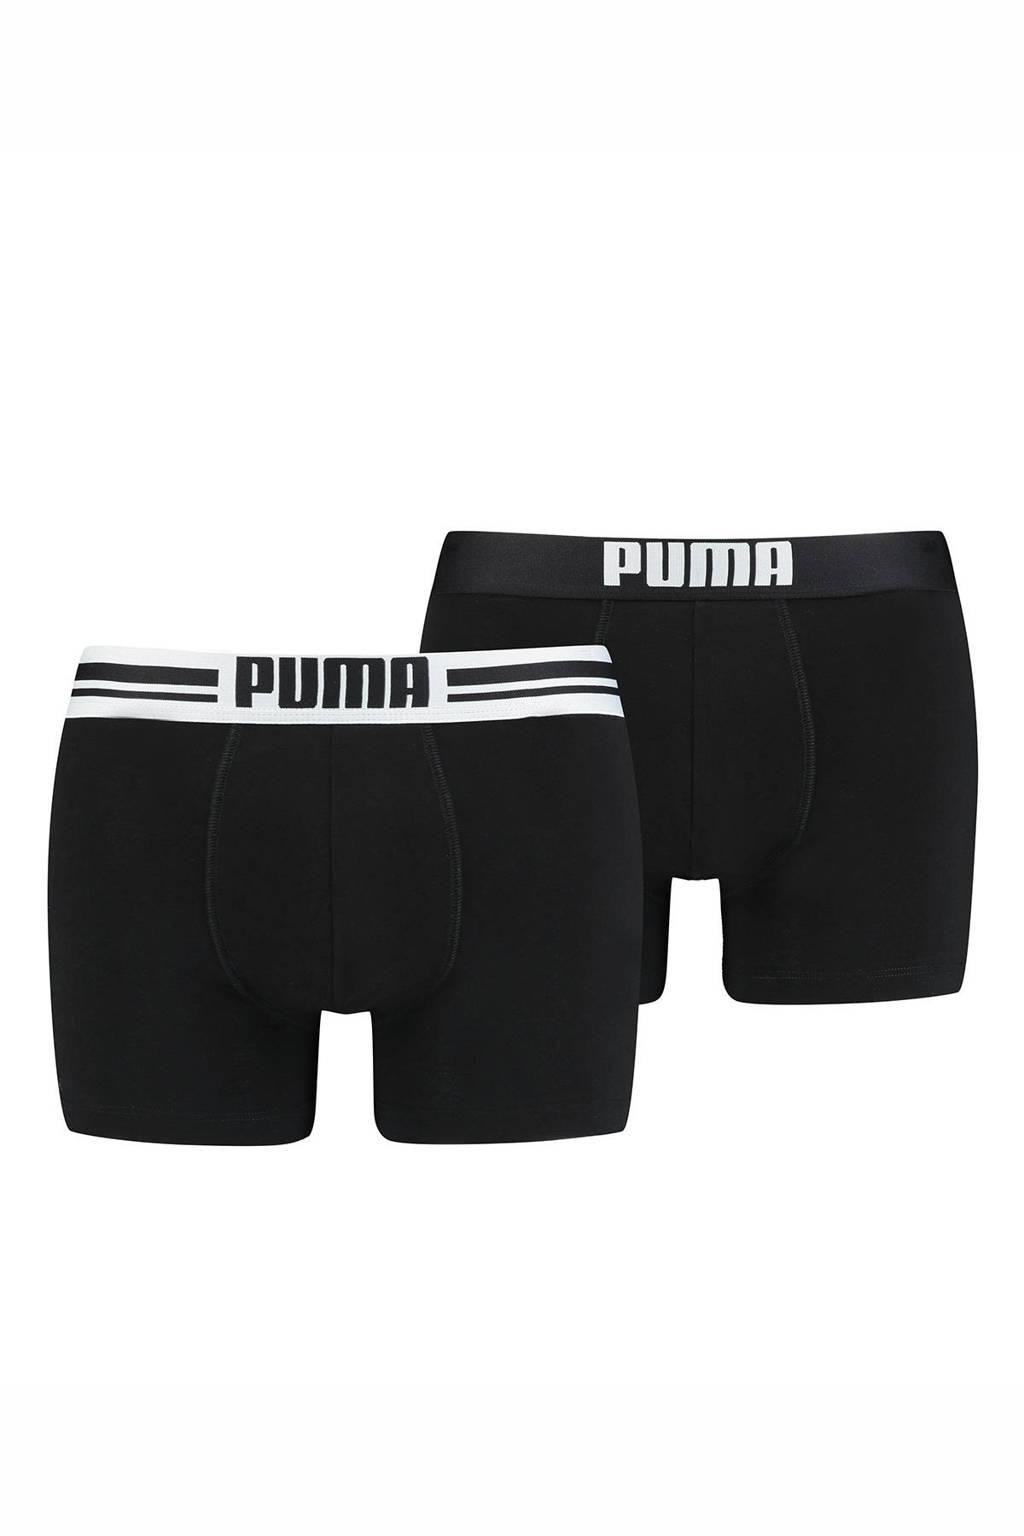 Puma Bodywear boxershort (set van 2), Zwart